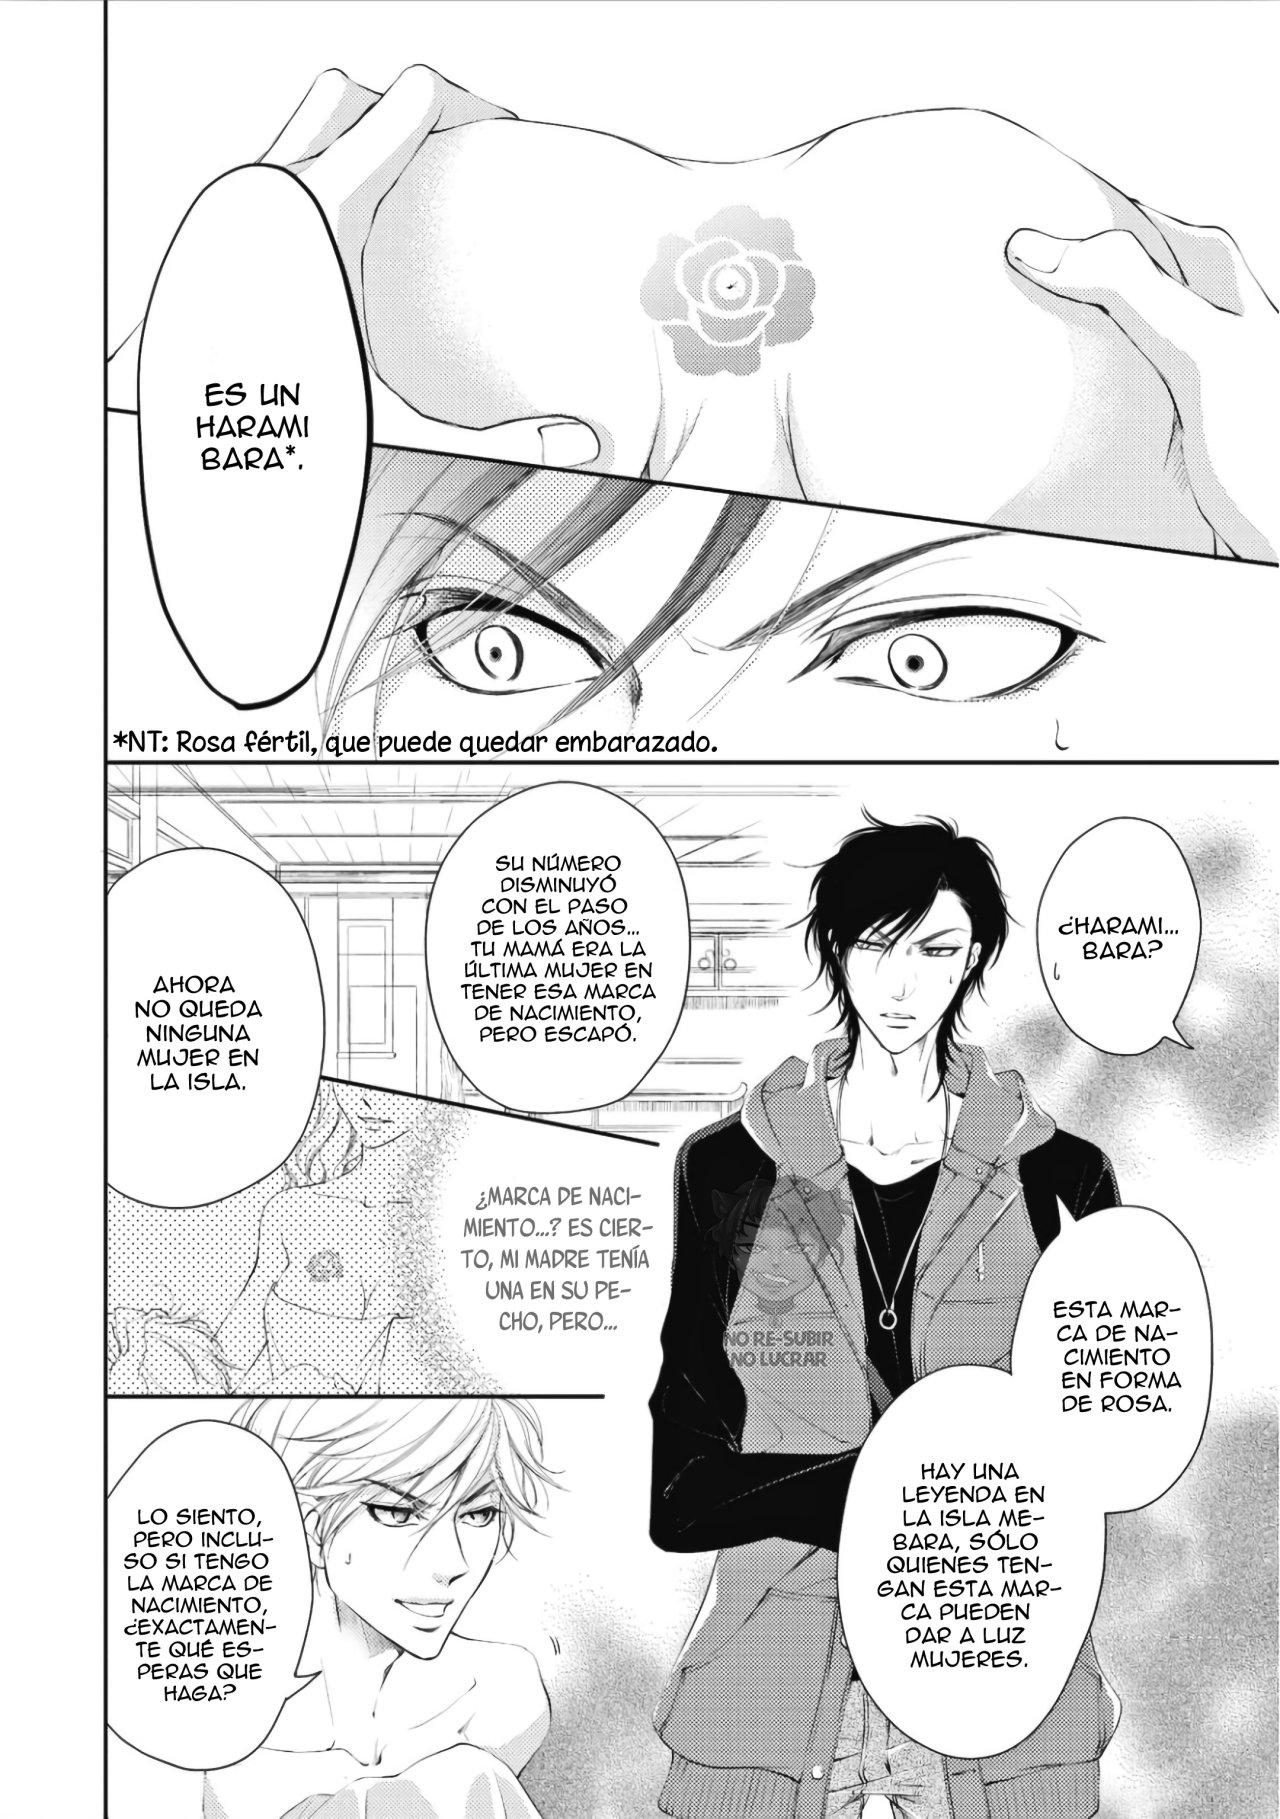 https://nine.mangadogs.com/es_manga/pic8/51/36659/946321/169c542306442d8ef169c0761d661257.jpg Page 18